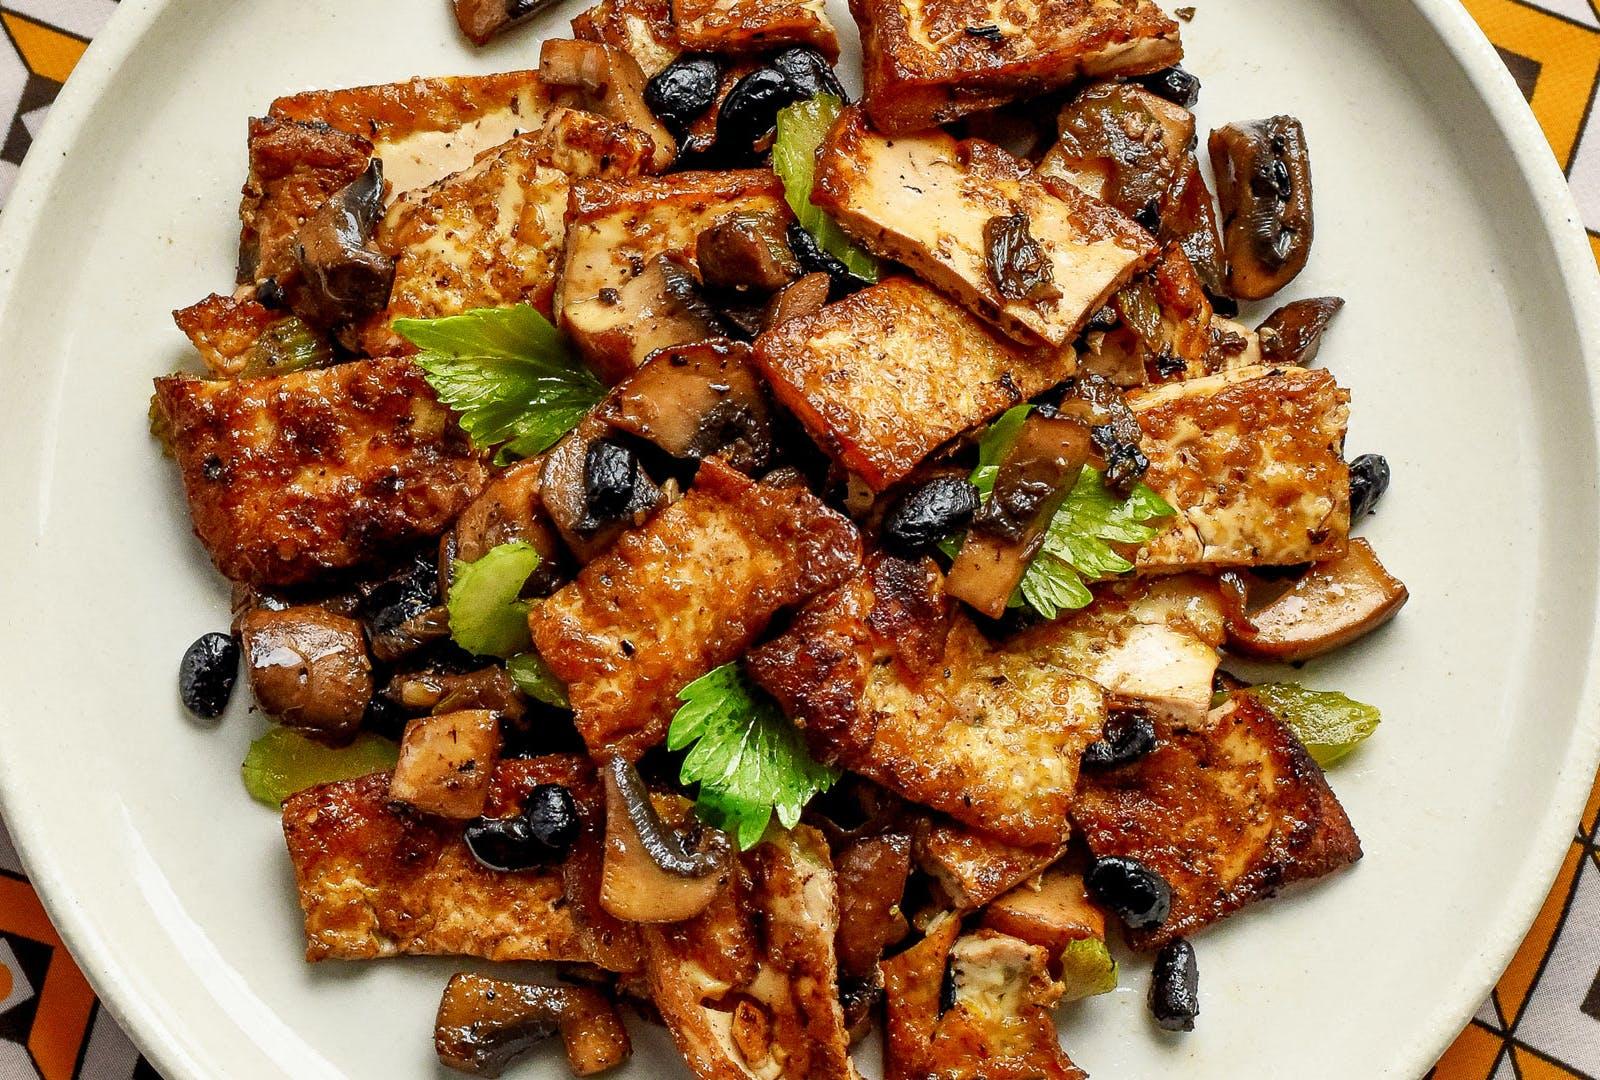 fermented black bean and tofu stir fry